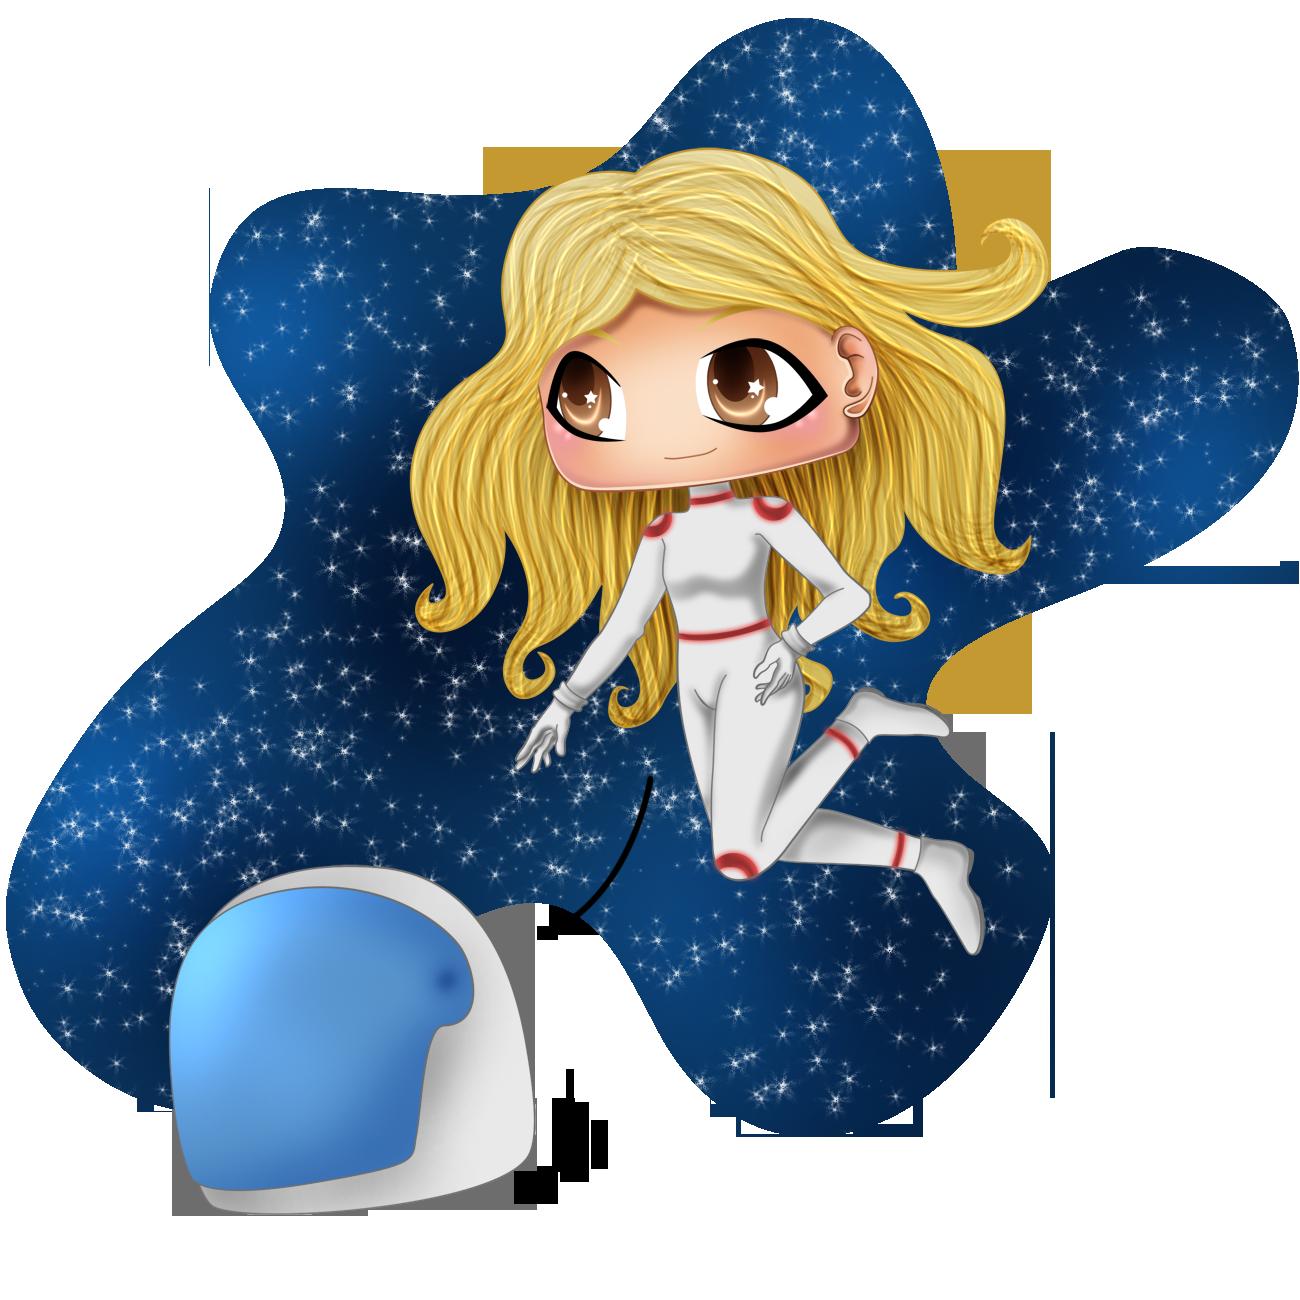 Commission: Chibi BlondHaired Girl in Cosmos by kinga-saiyans